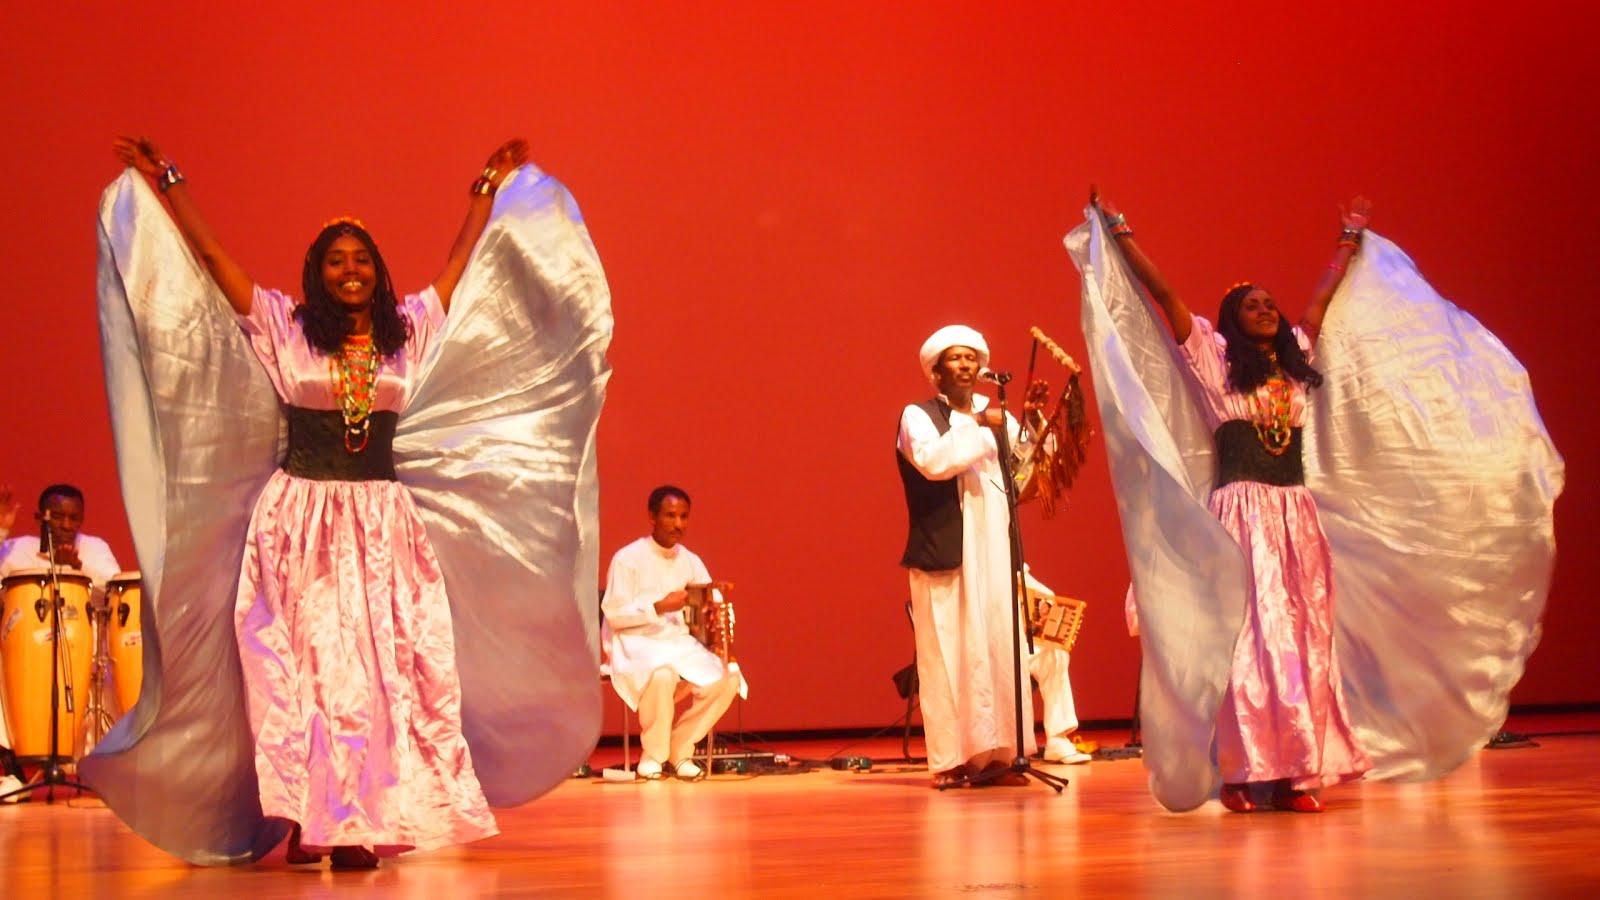 <Eritrea to send cultural troupes to Ethiopia